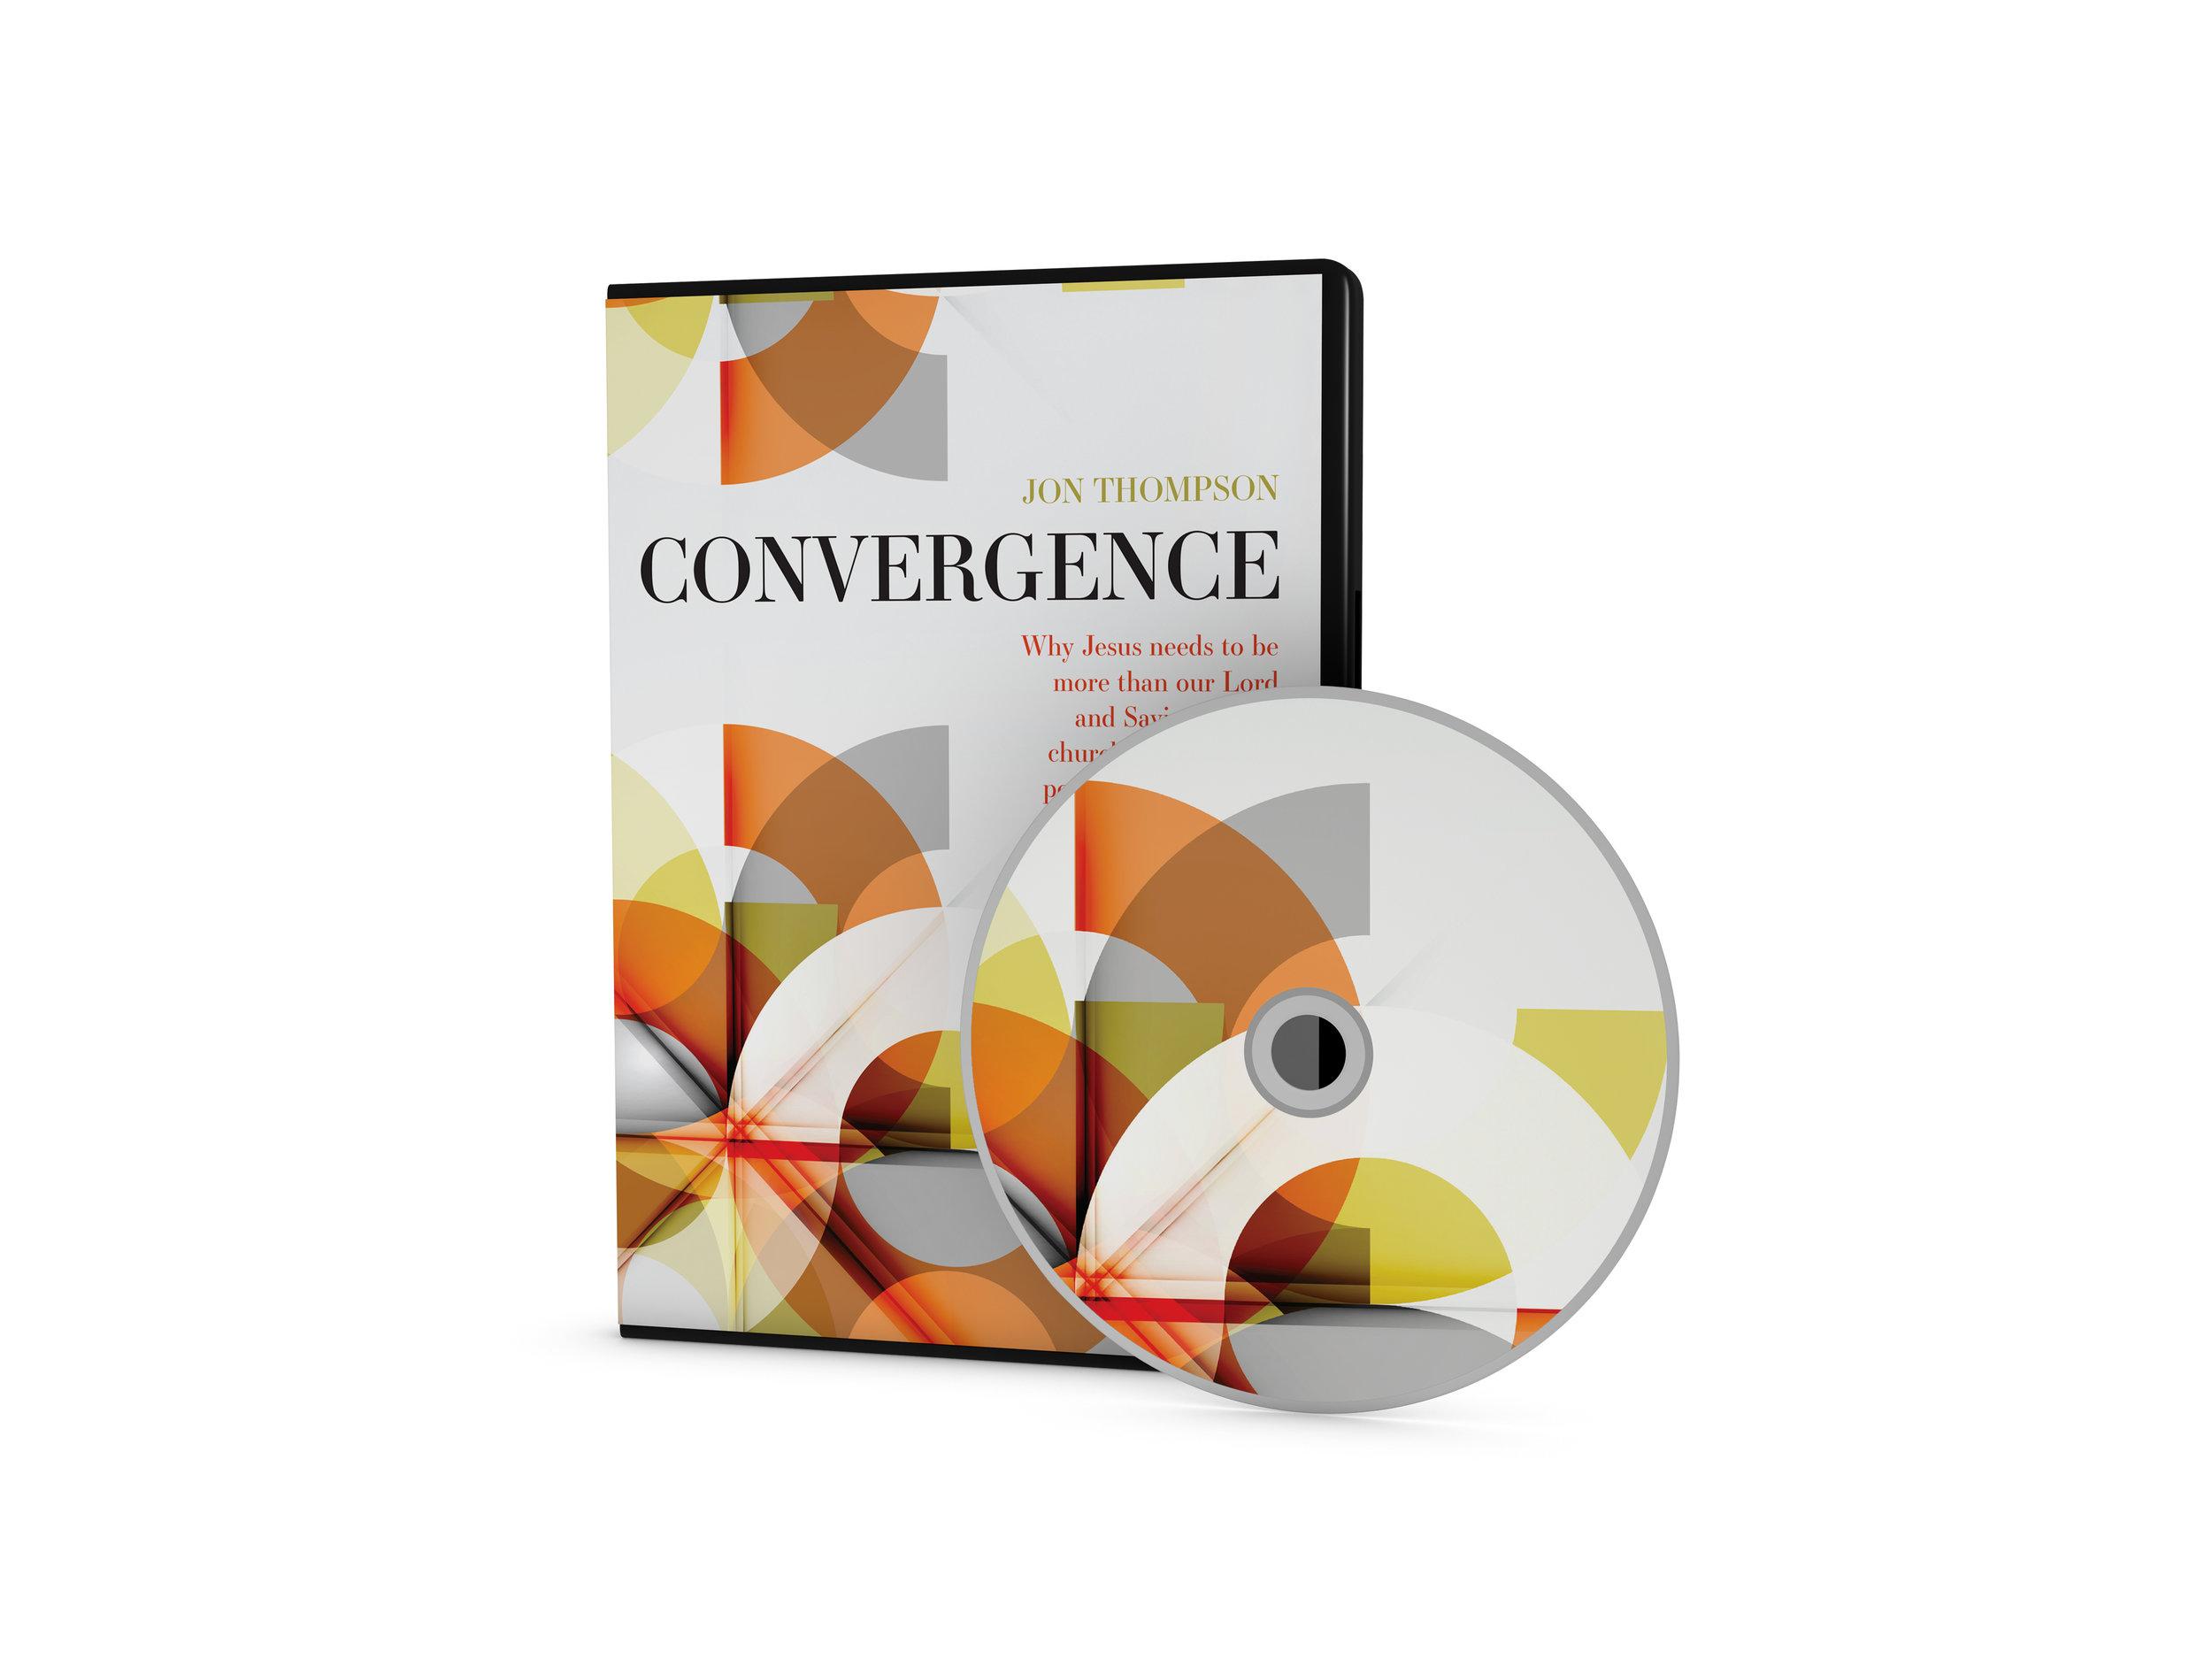 18-11-26-Convergence-DVD-Cover-2.jpg